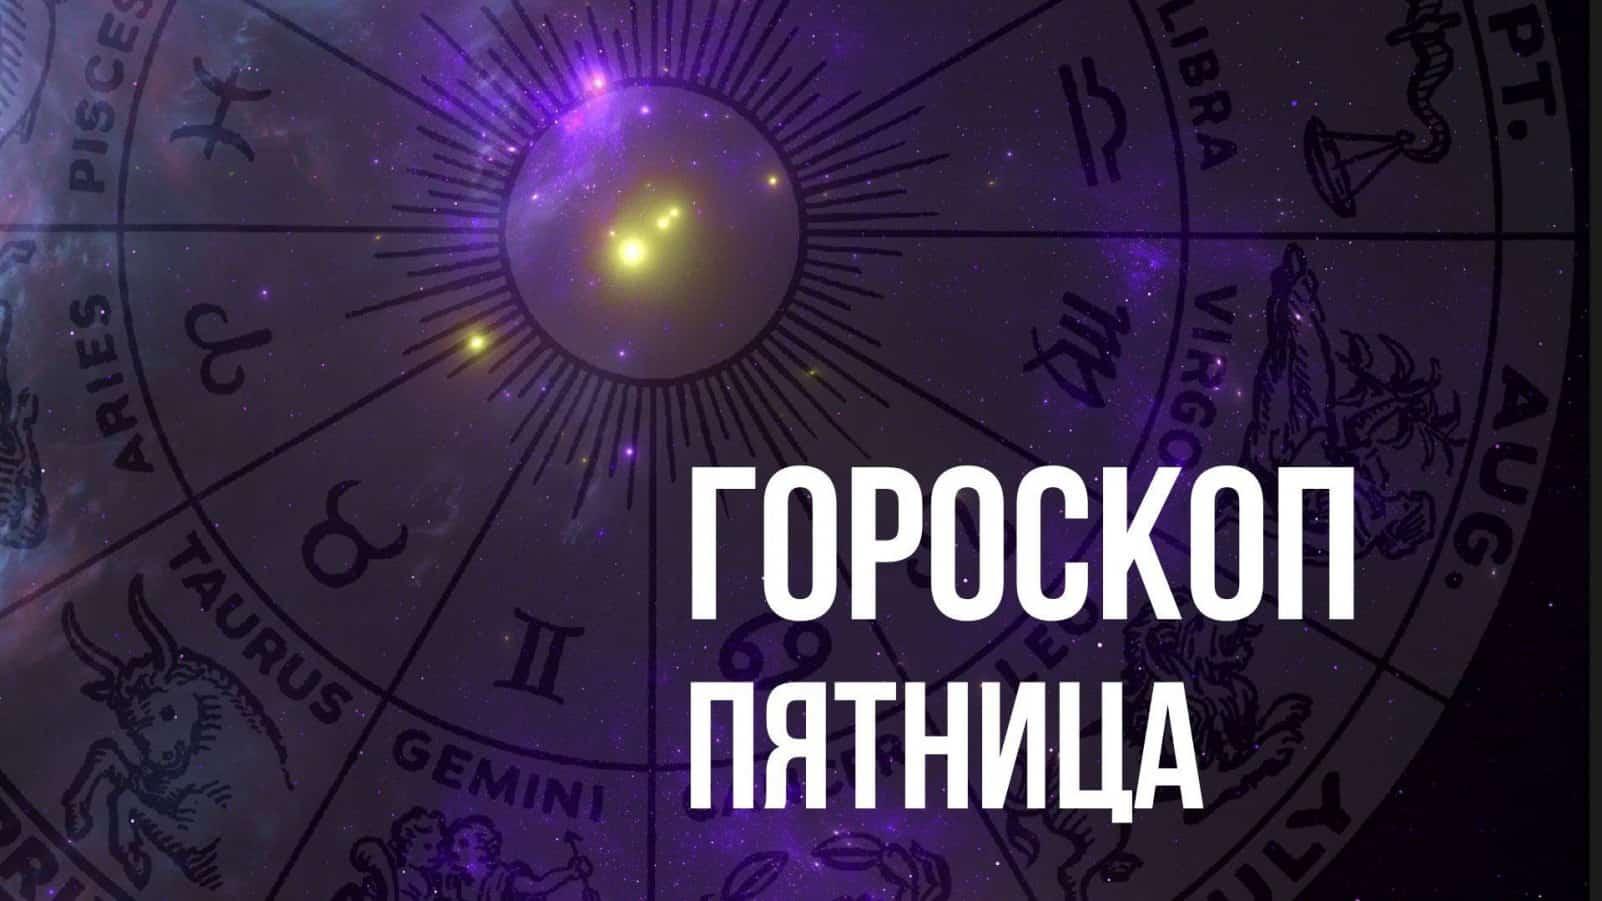 Гороскоп на пятницу 6 августа для каждого знака Зодиака